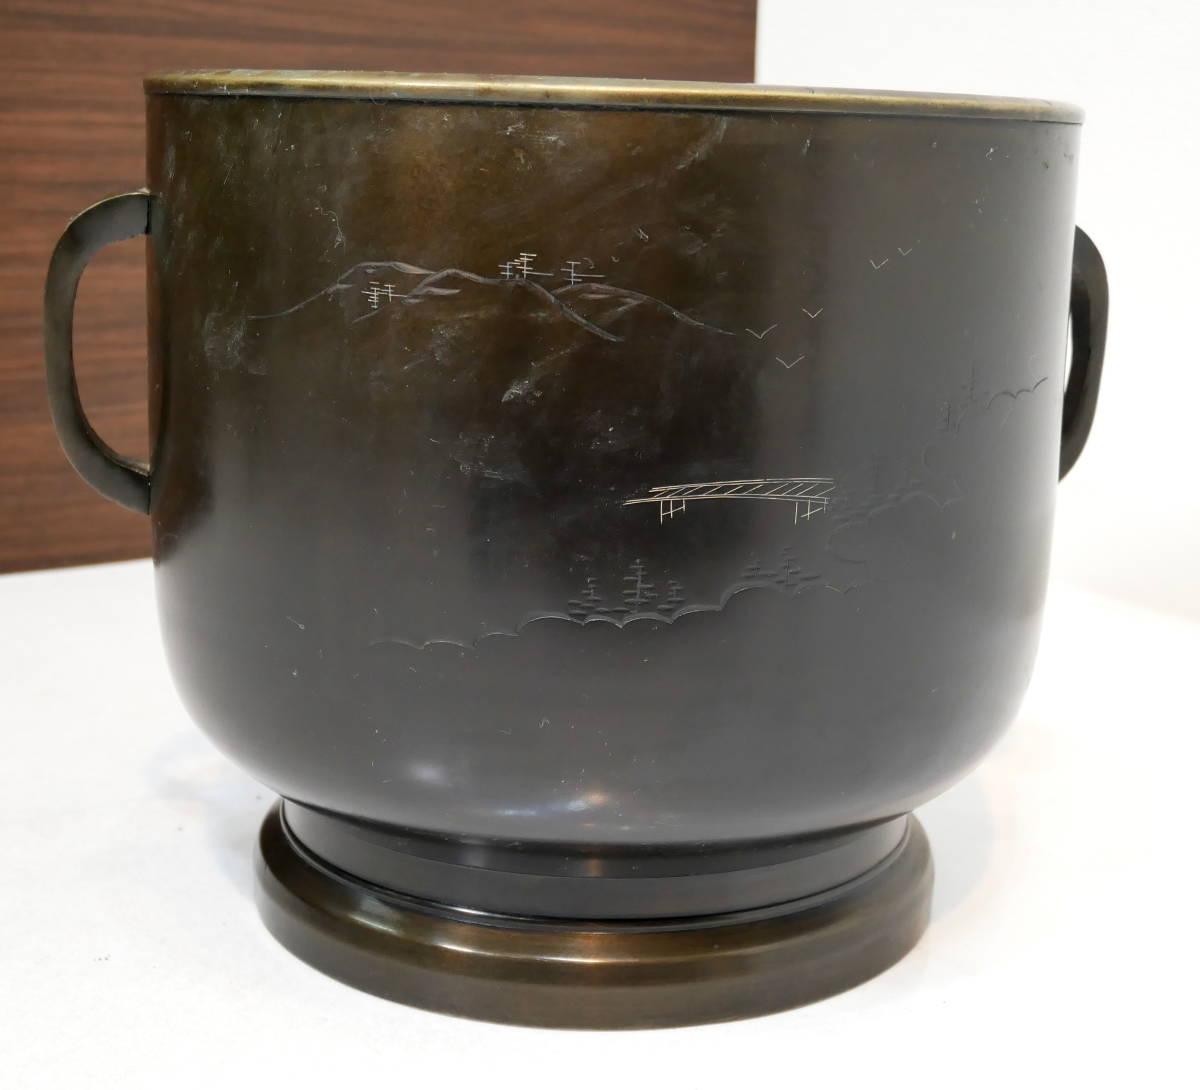 ▲(R205-B121)時代物 銅火鉢 真鍮 黄銅 共箱付き 直径26cm 高さ24cm 火ばち 置物 アンティーク 灰付_画像4